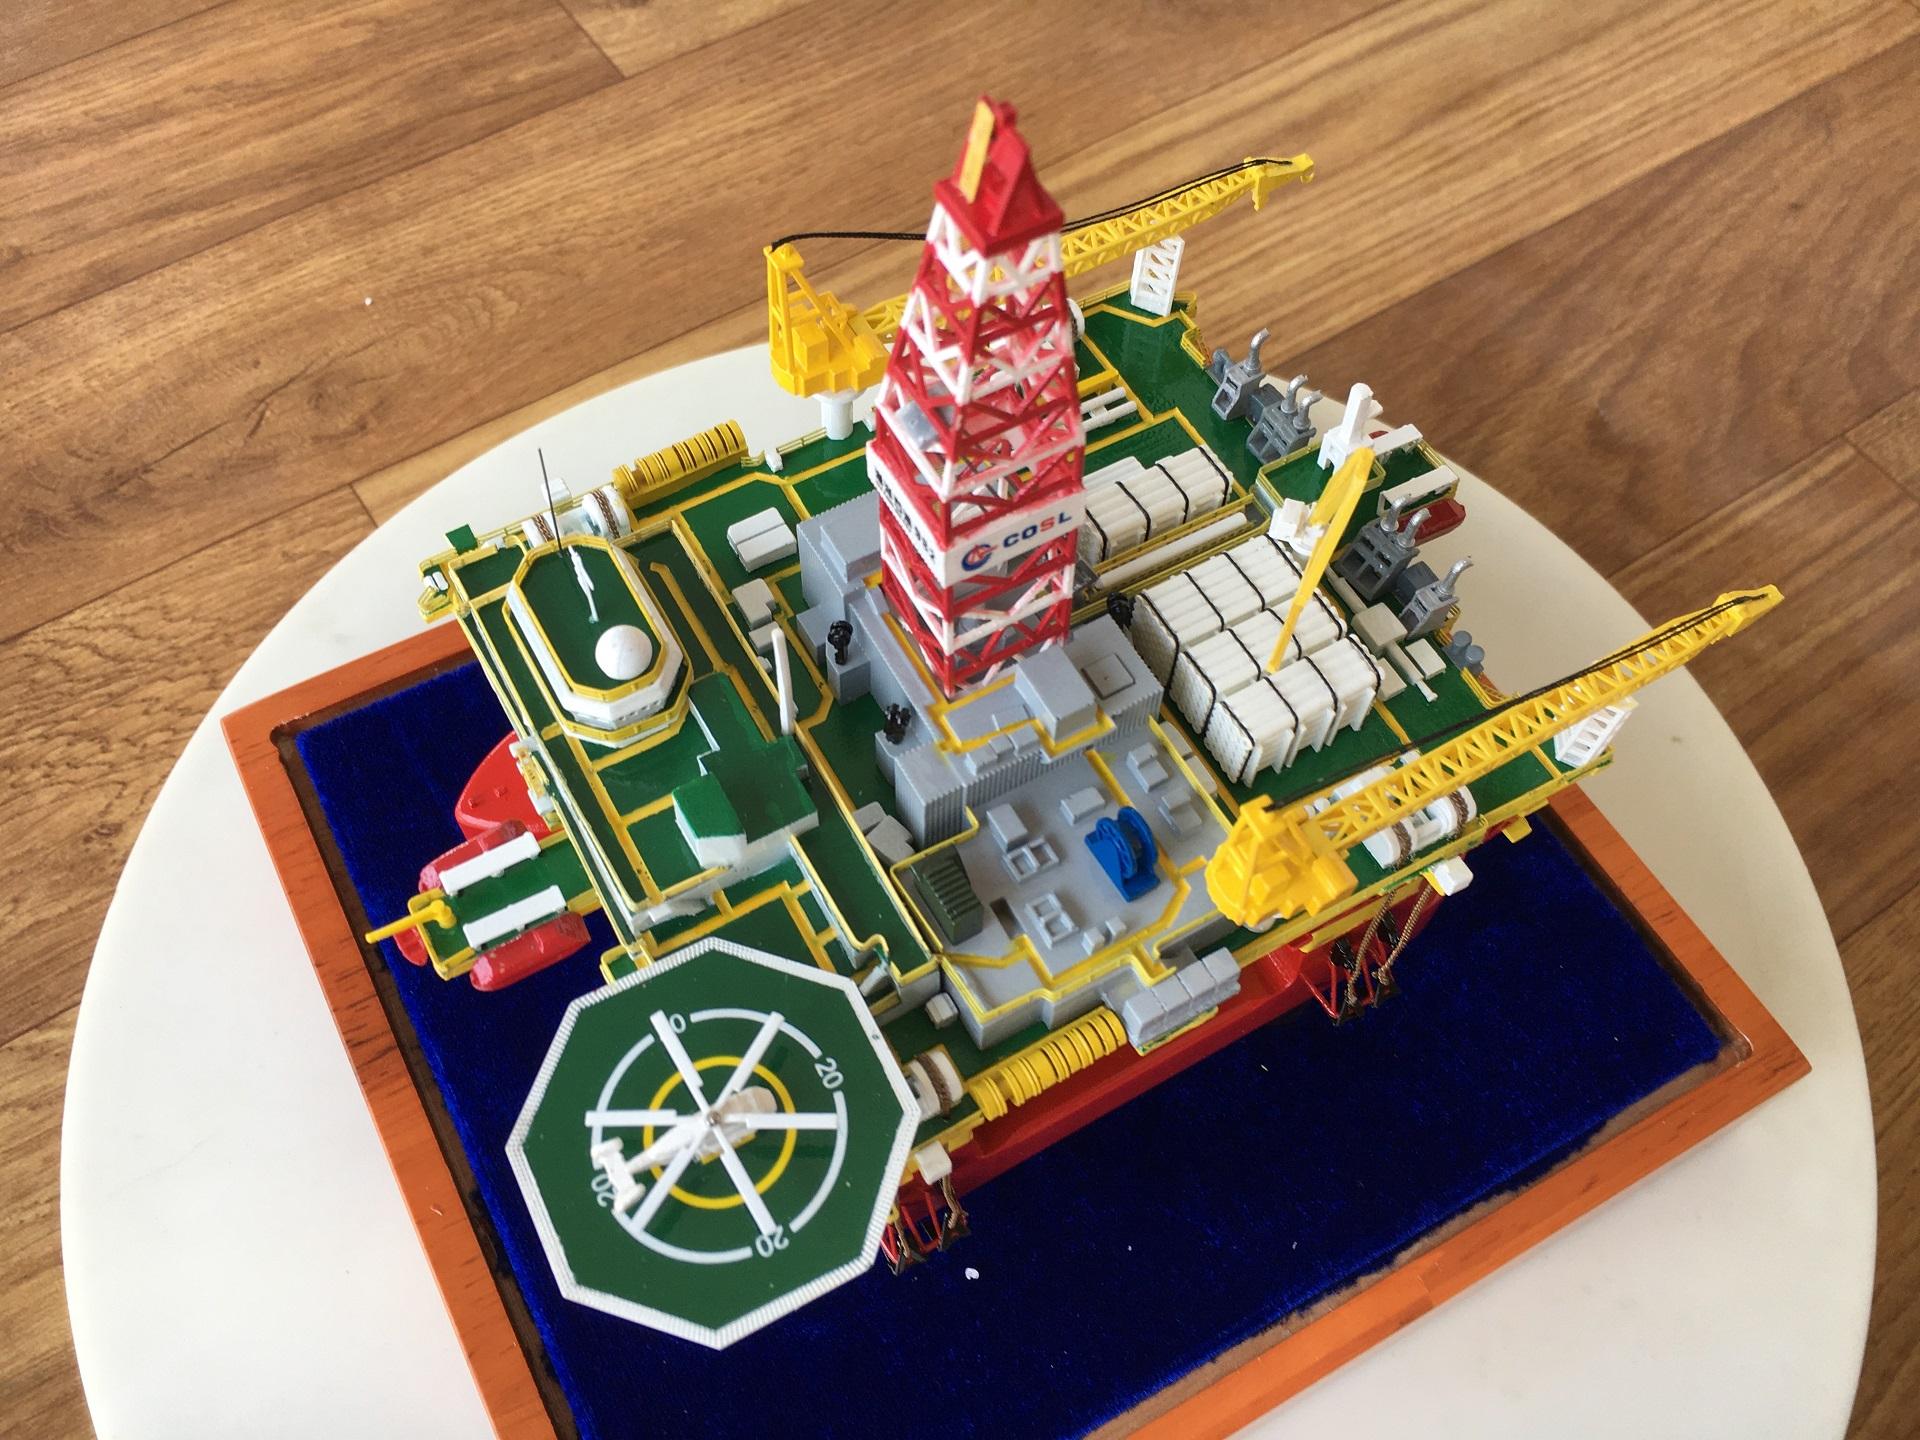 1/700 oil platform scale model, offshore platform Die-cast scale model, offshore drilling rig Diecast scale model, Hai Yang Shi You 982 Semi-Submersible Oil Platform Scale Model.